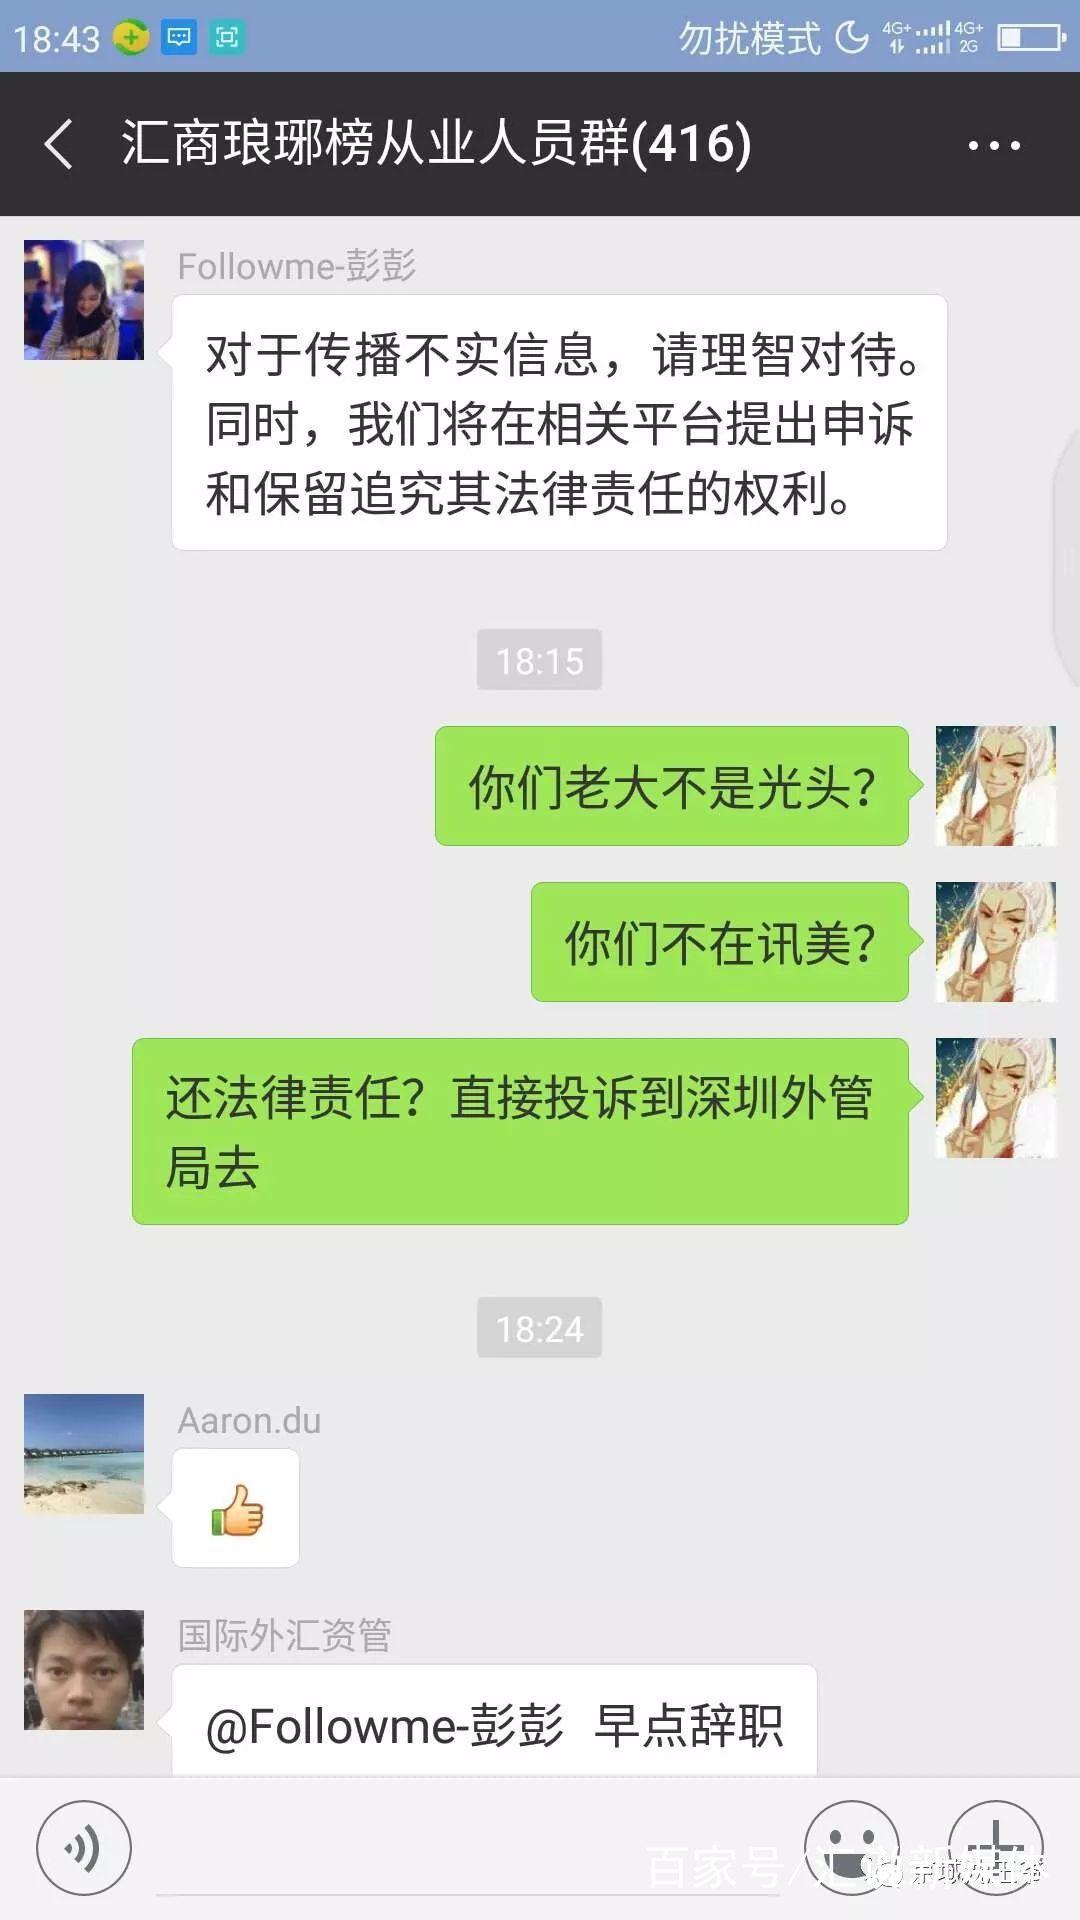 Followme与香港坚固的背后股东关联图曝光(二)